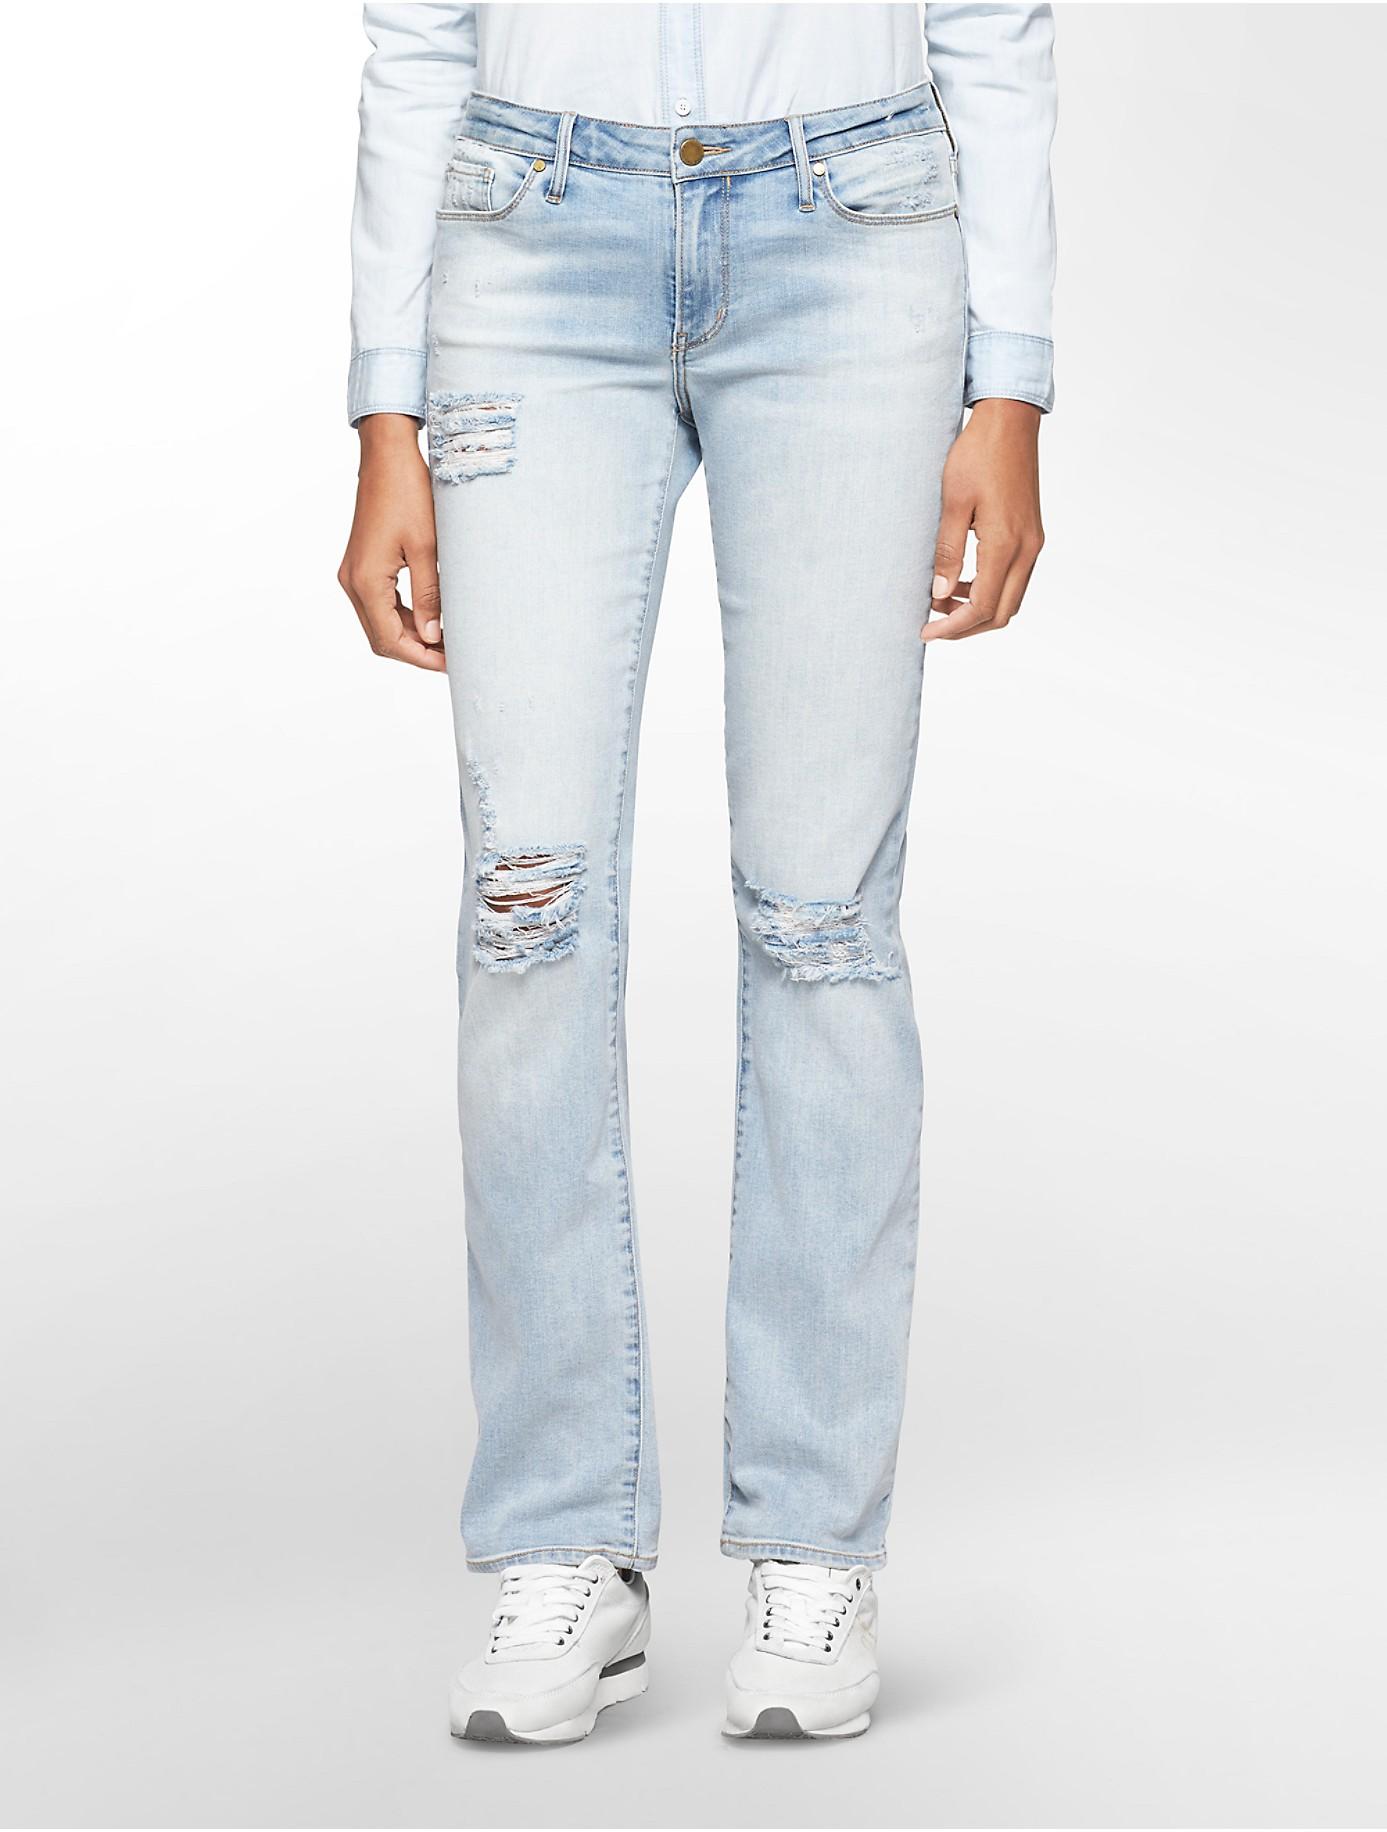 Calvin klein Jeans Straight Leg Destroyed Light Wash Jeans in Blue ...